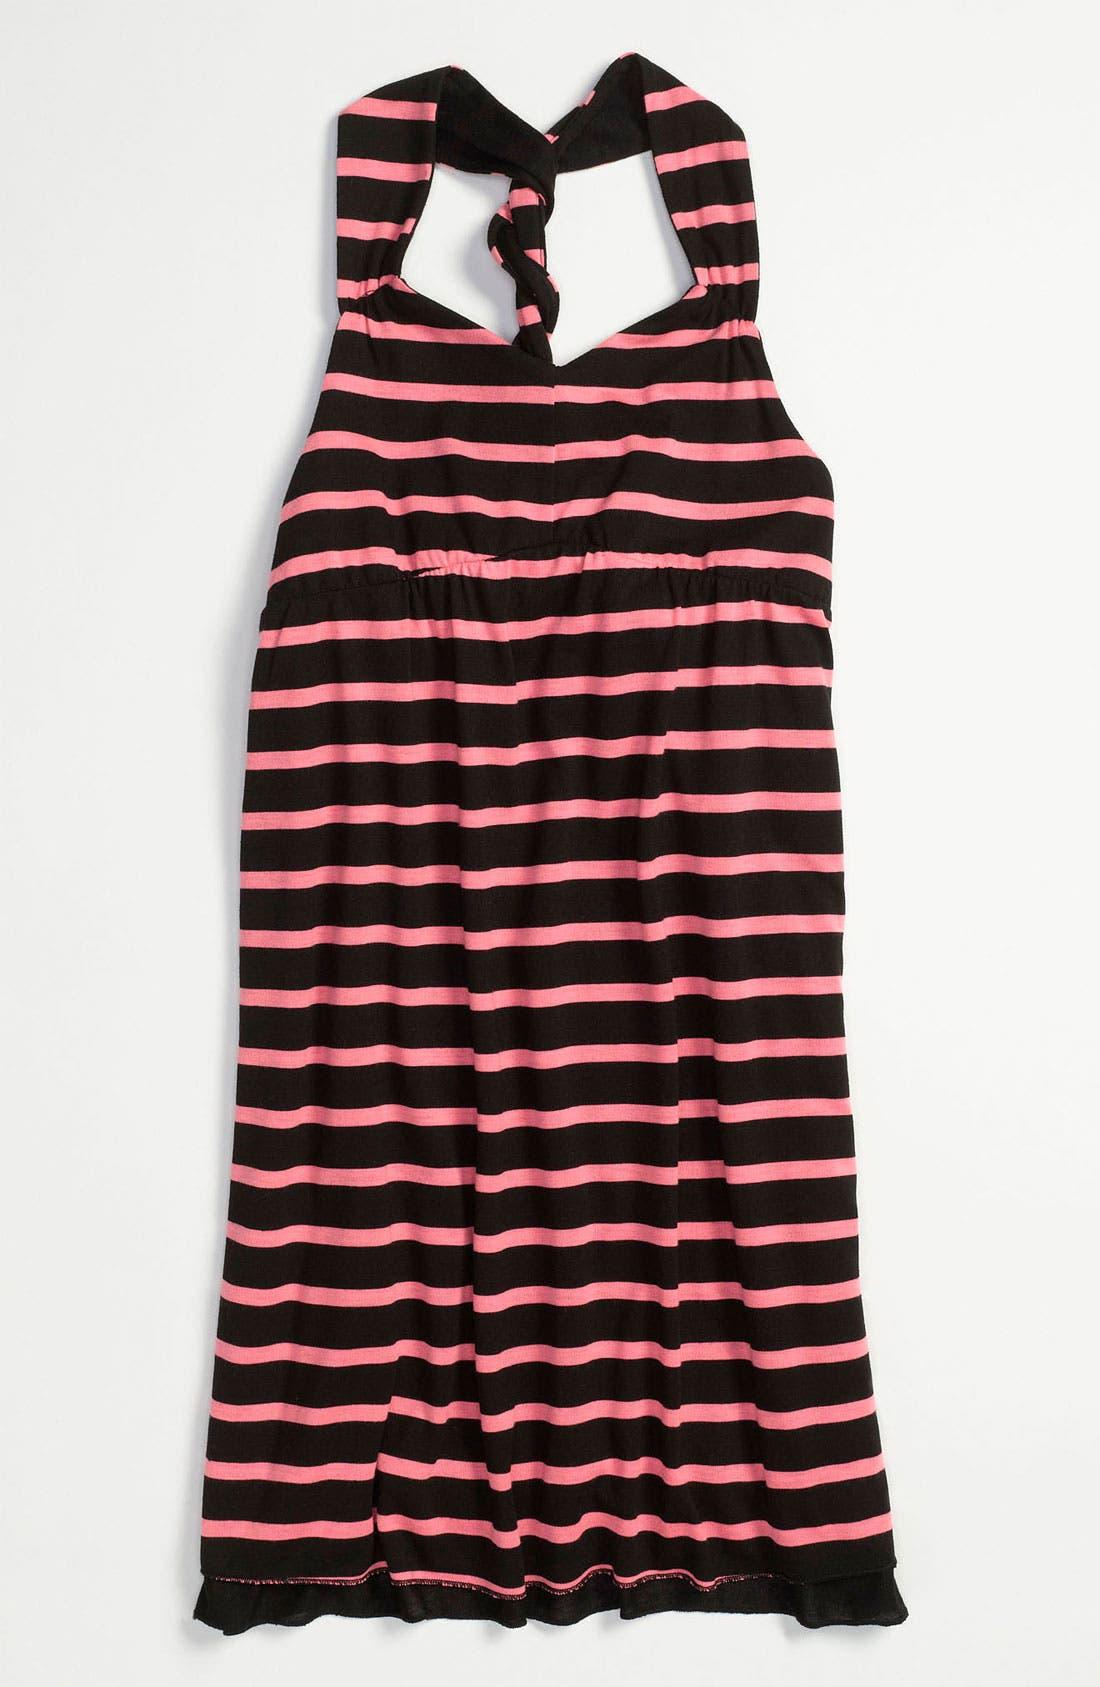 Alternate Image 1 Selected - Little Pretties Reversible Dress (Little Girls & Big Girls)